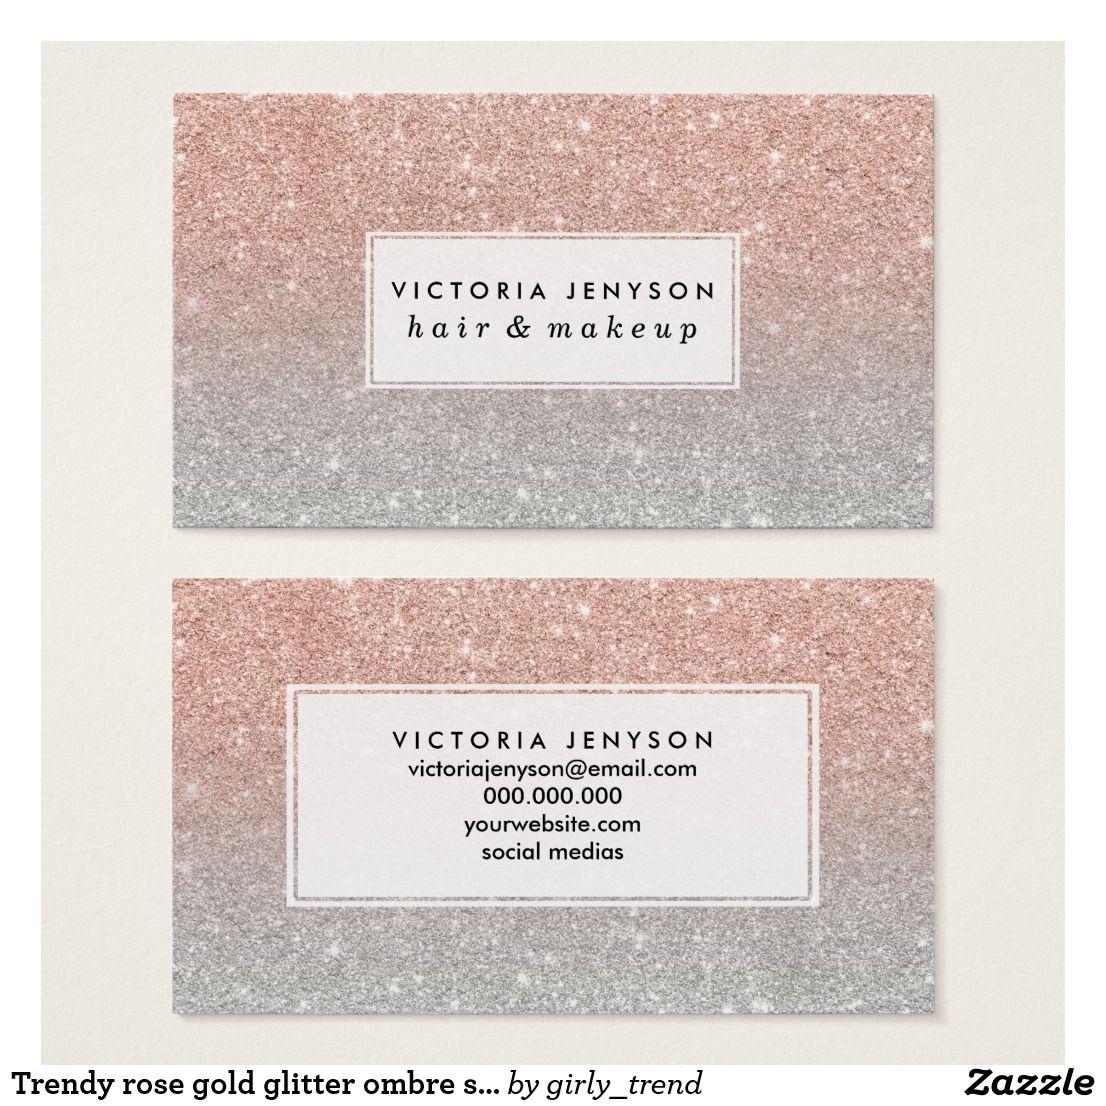 Trendy rose gold glitter ombre silver glitter business card trendy rose gold glitter ombre silver glitter business card colourmoves